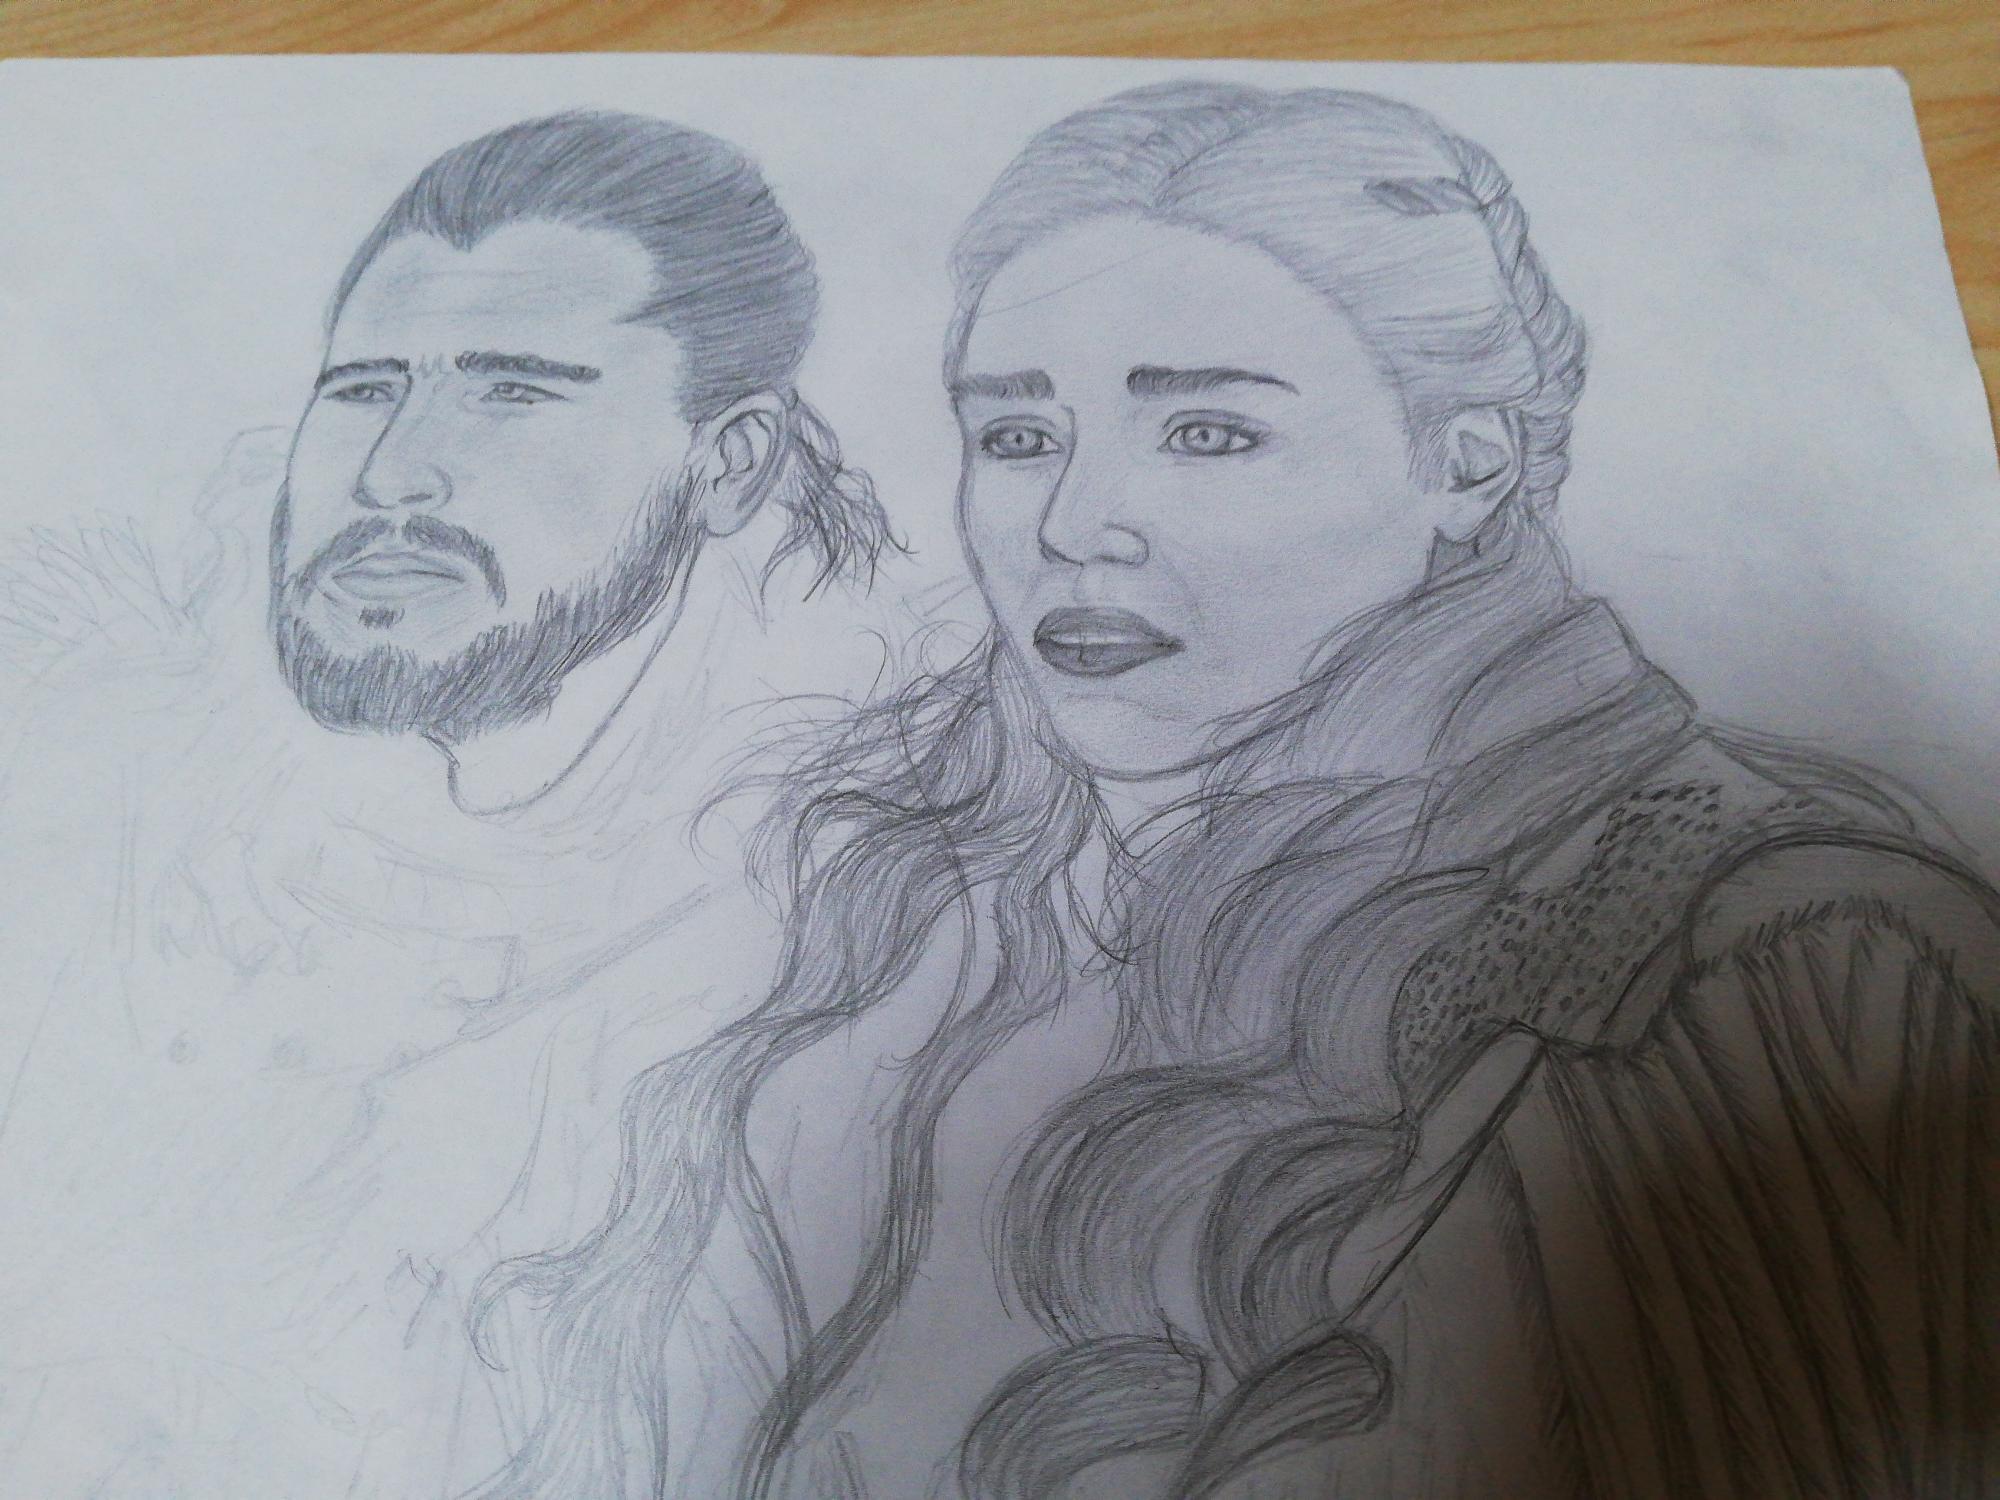 Je n'ai pas encore fini ce dessin 😉